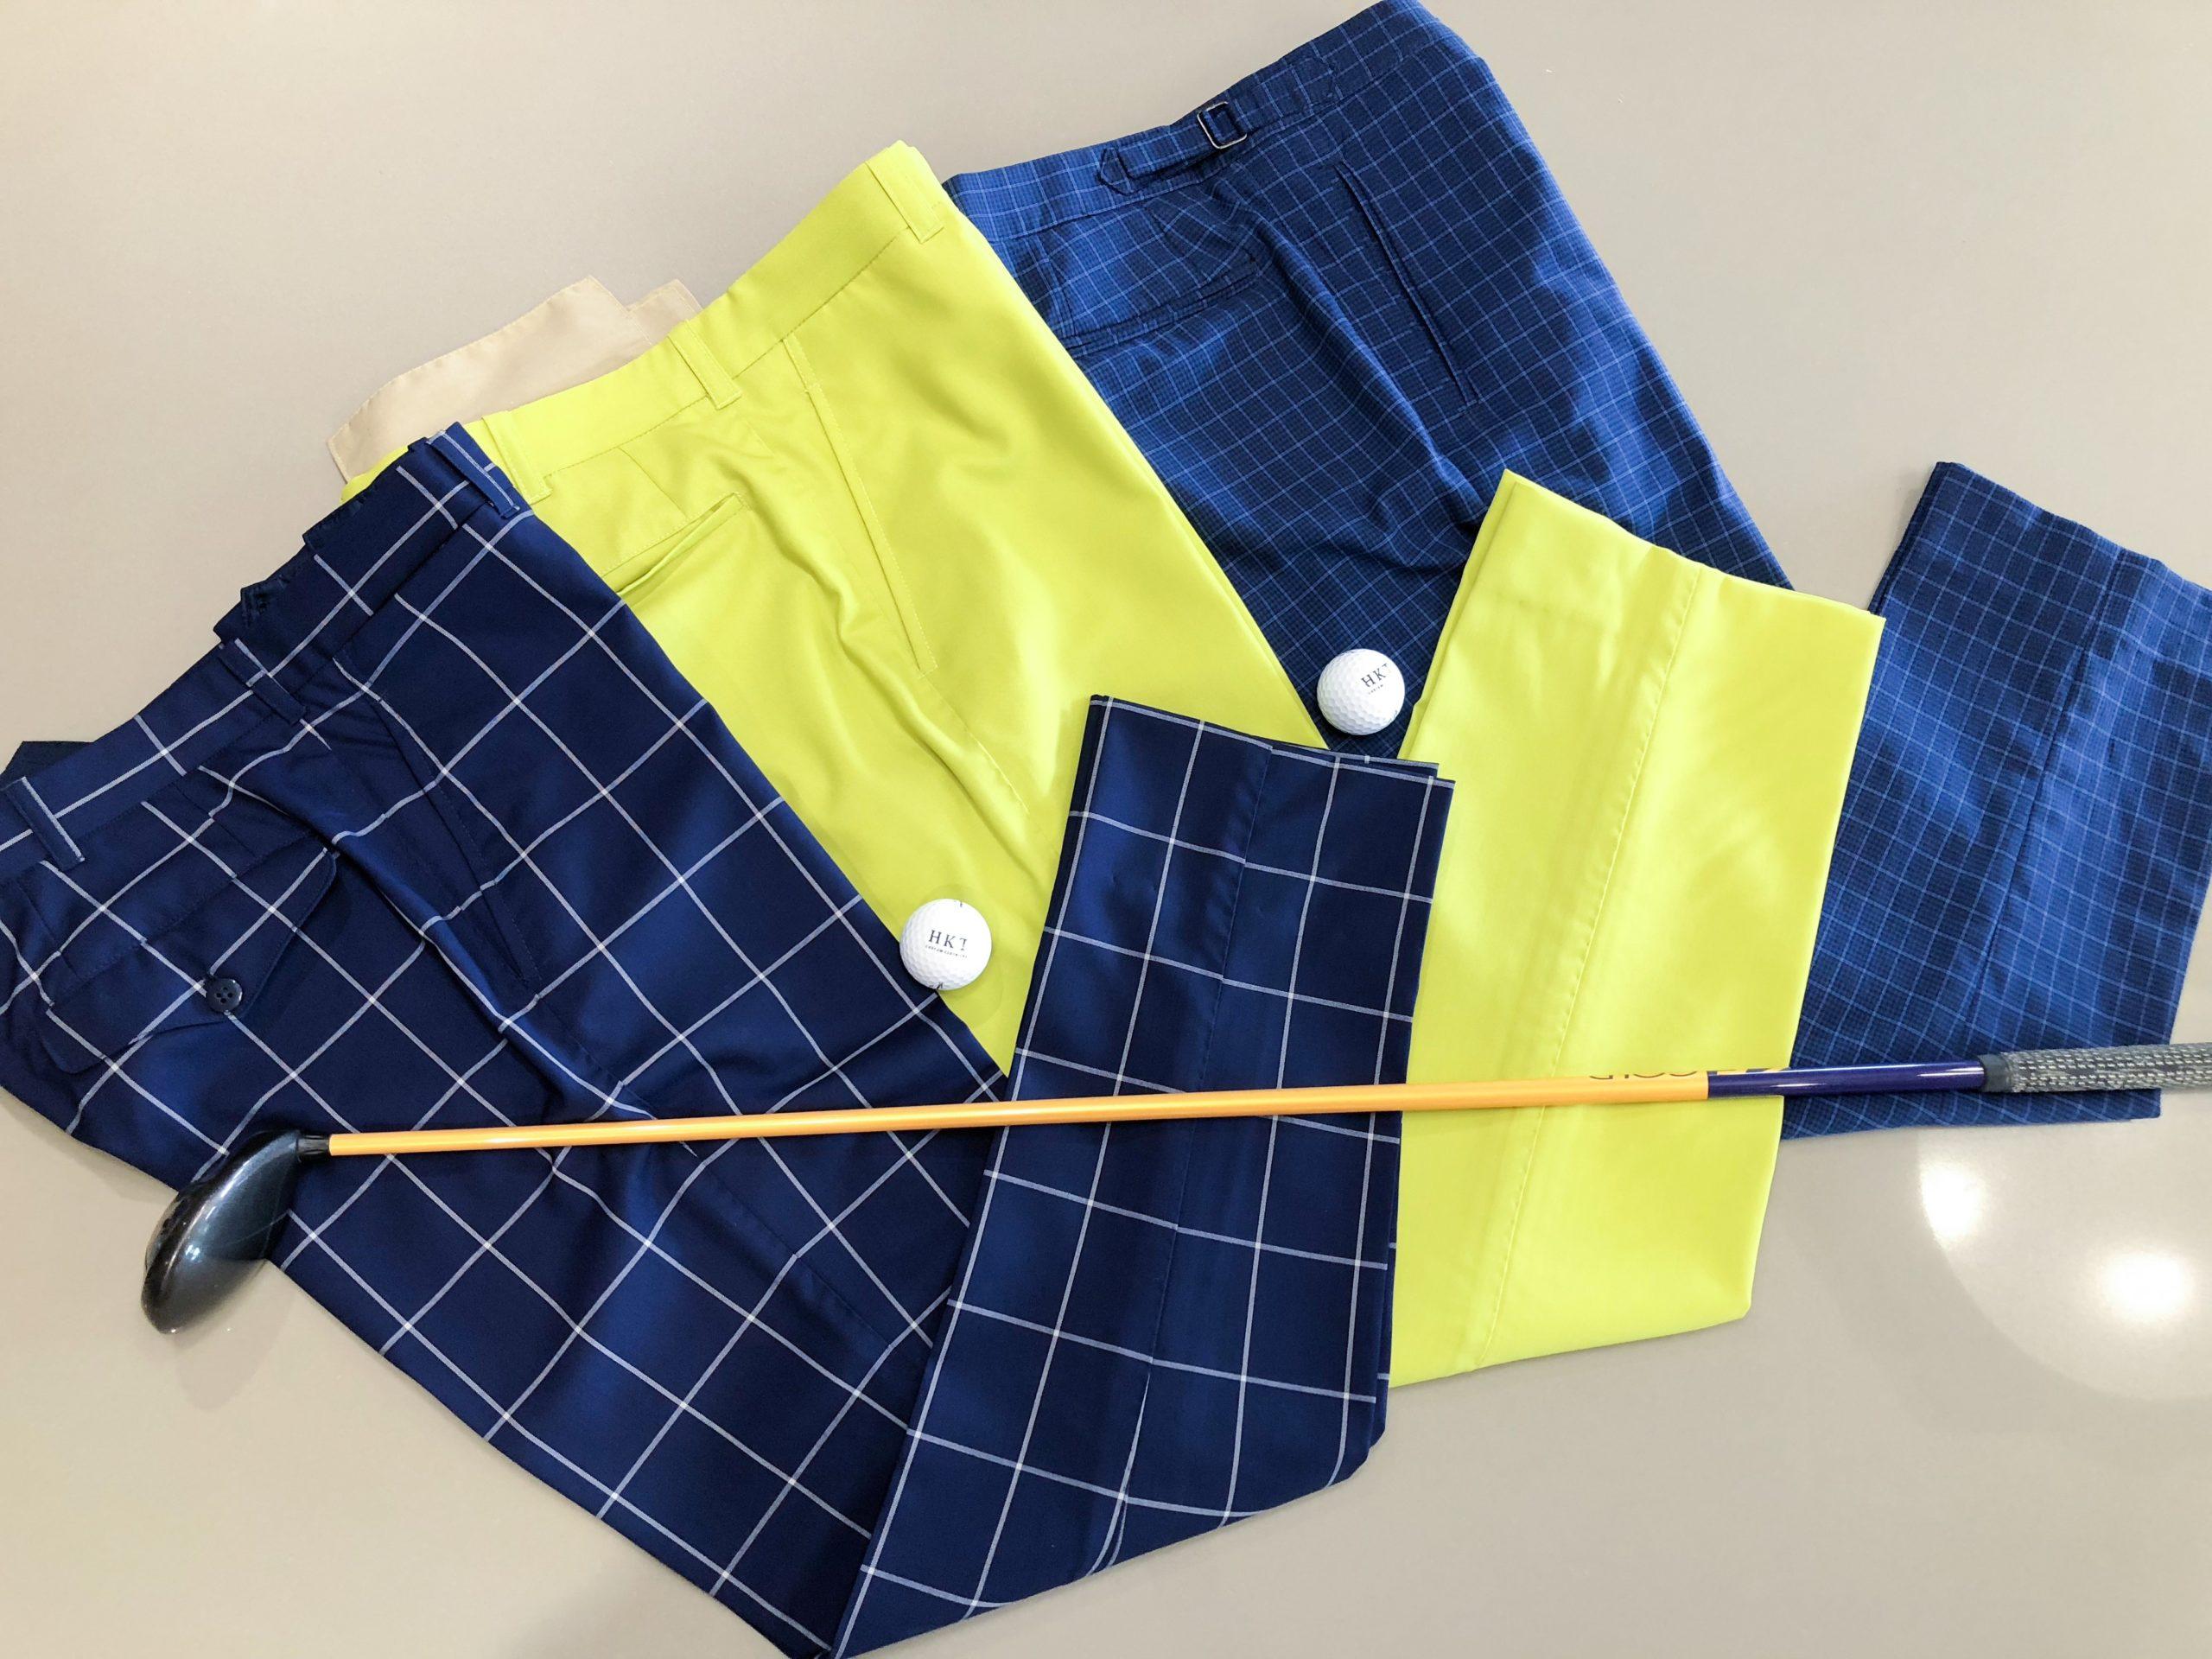 Bespoke Golf Pants and Custom Made Polos